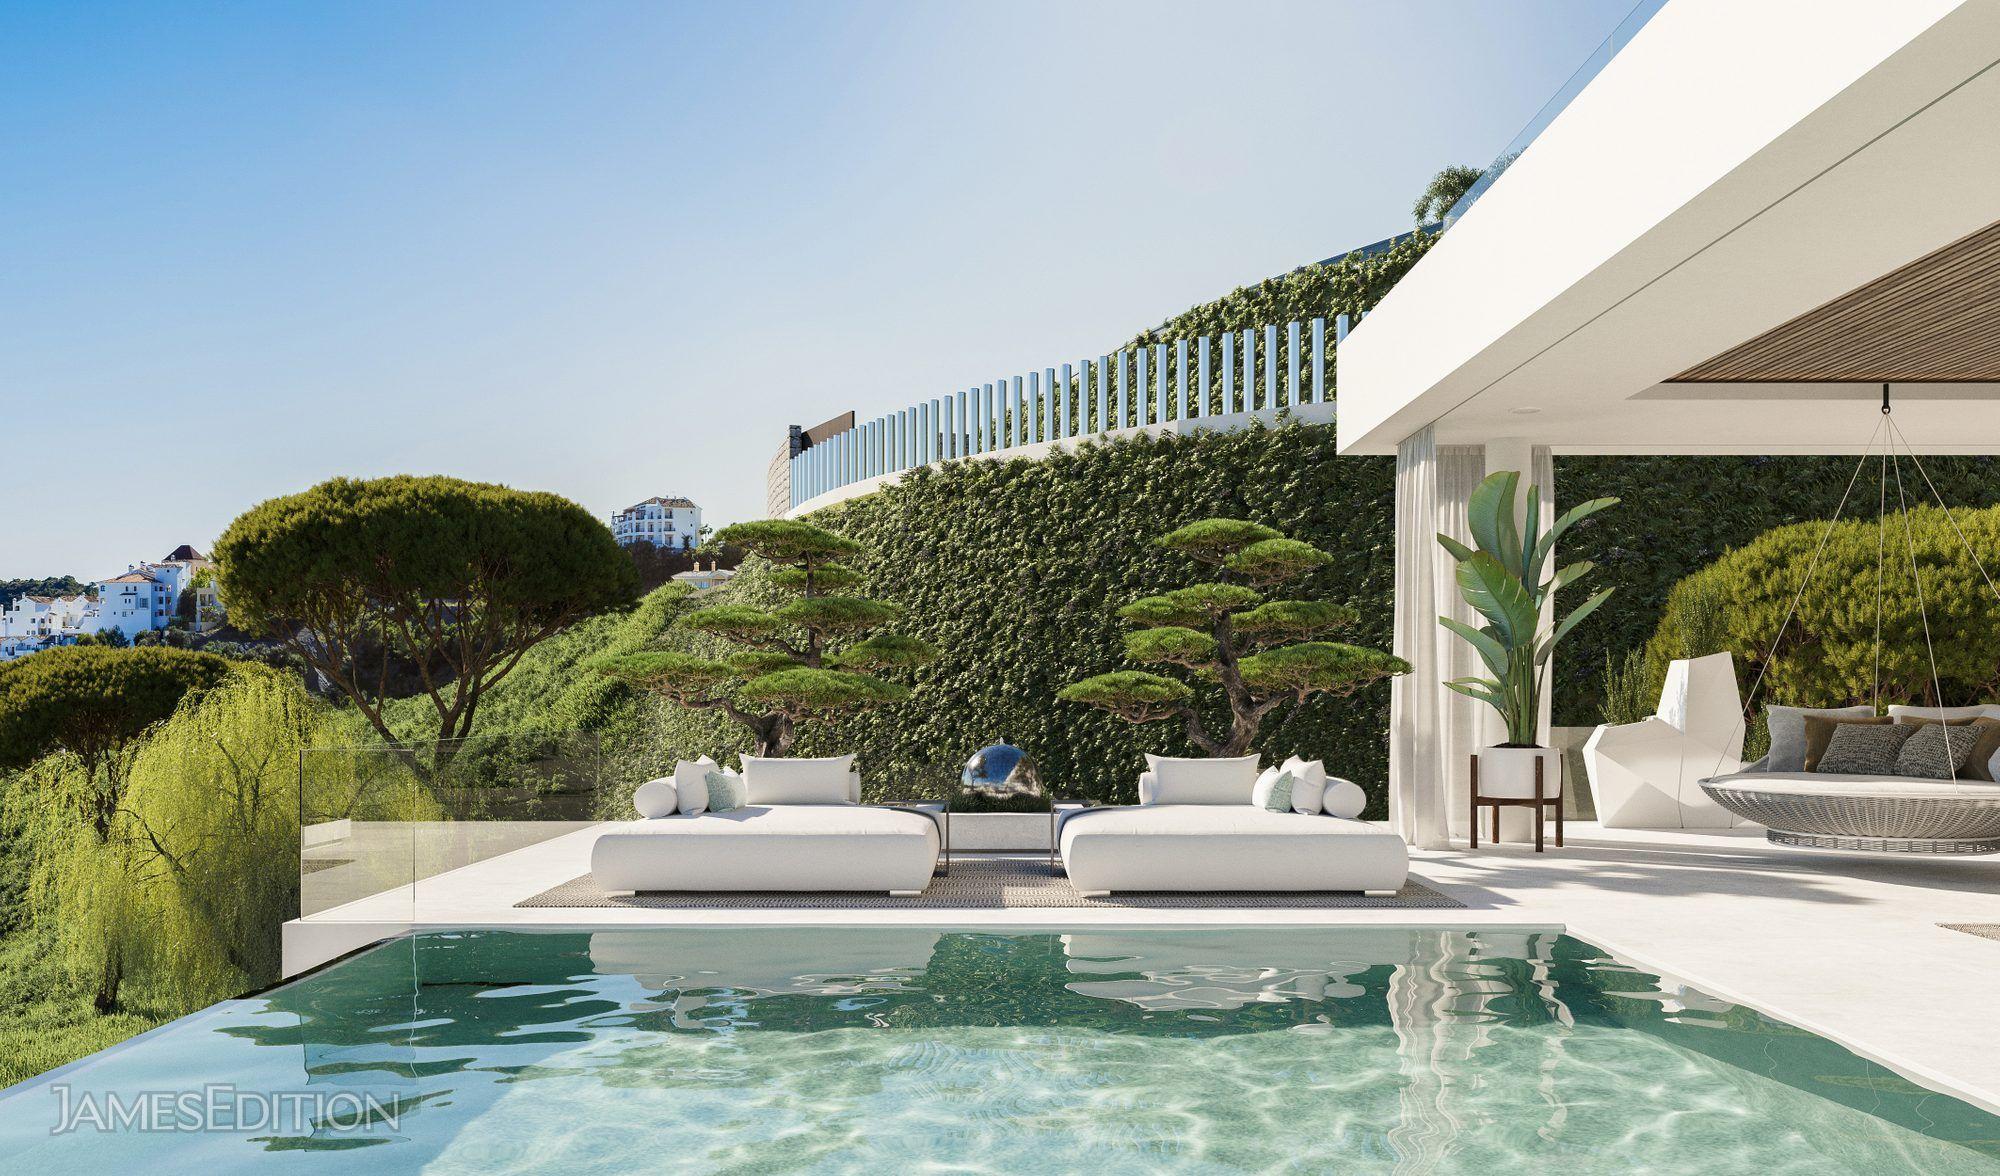 New Luxury Villa In Alcuzcuz Marbella In Marbella Spain For Sale 10914989 In 2020 Marbella Luxury Villa Architecture